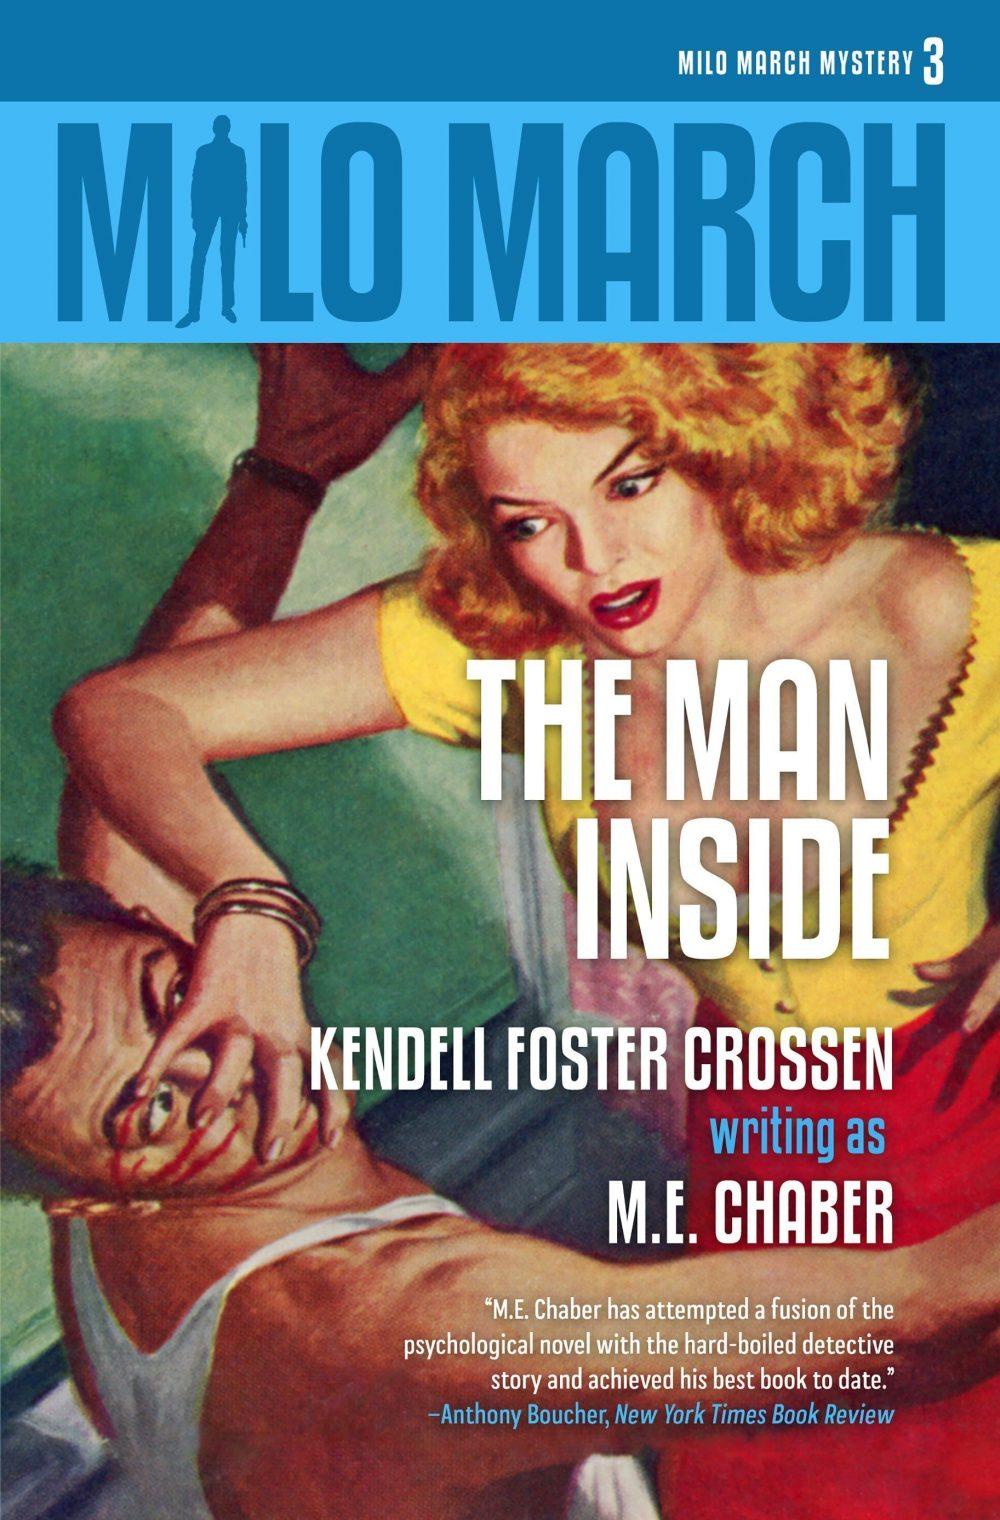 Milo March #3: The Man Inside